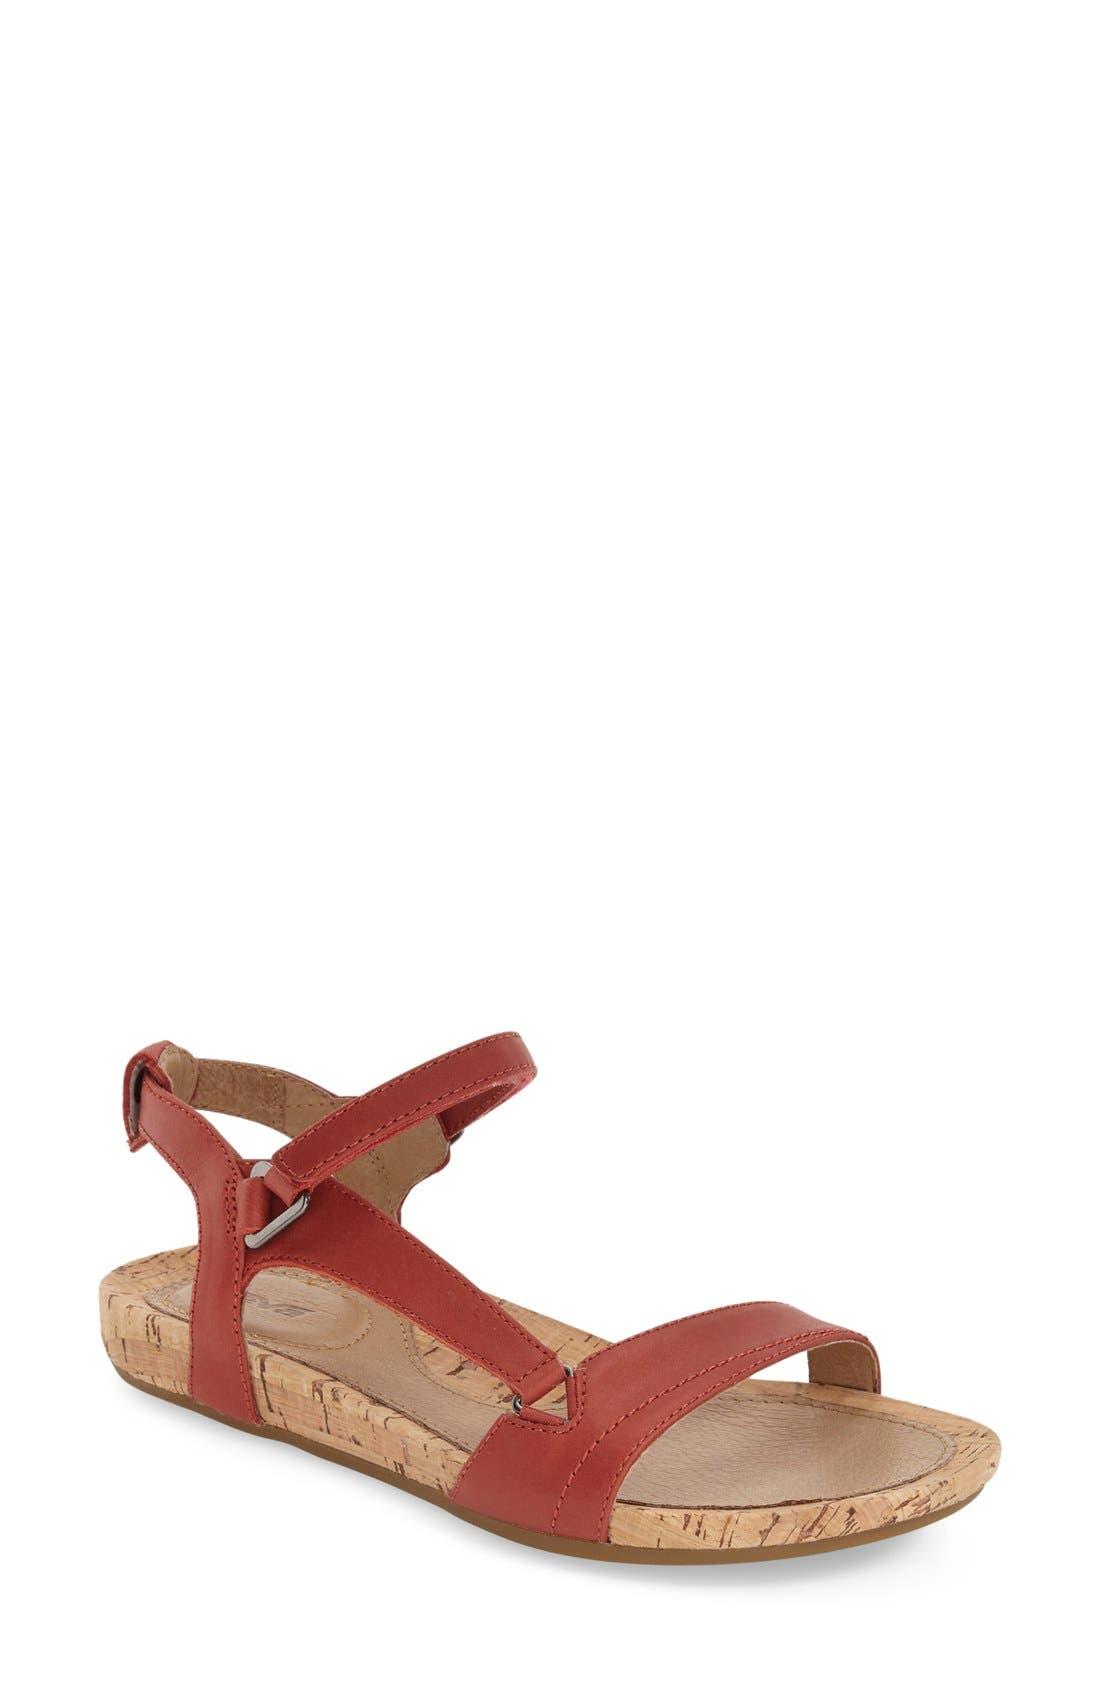 'Capri Universal' Sandal,                         Main,                         color, 616